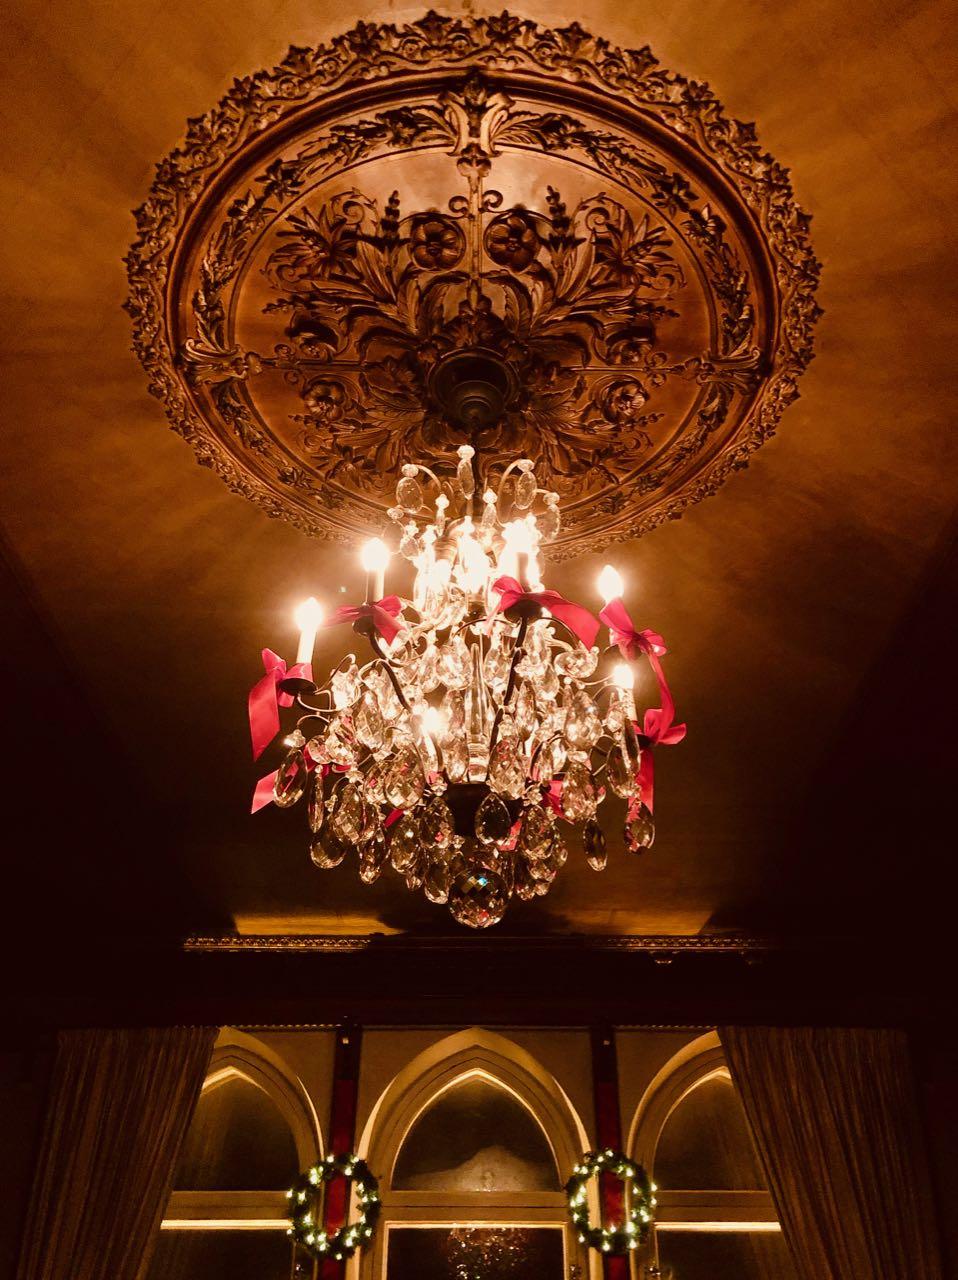 Thorskogs slott castle Christmas chandelier stucco review